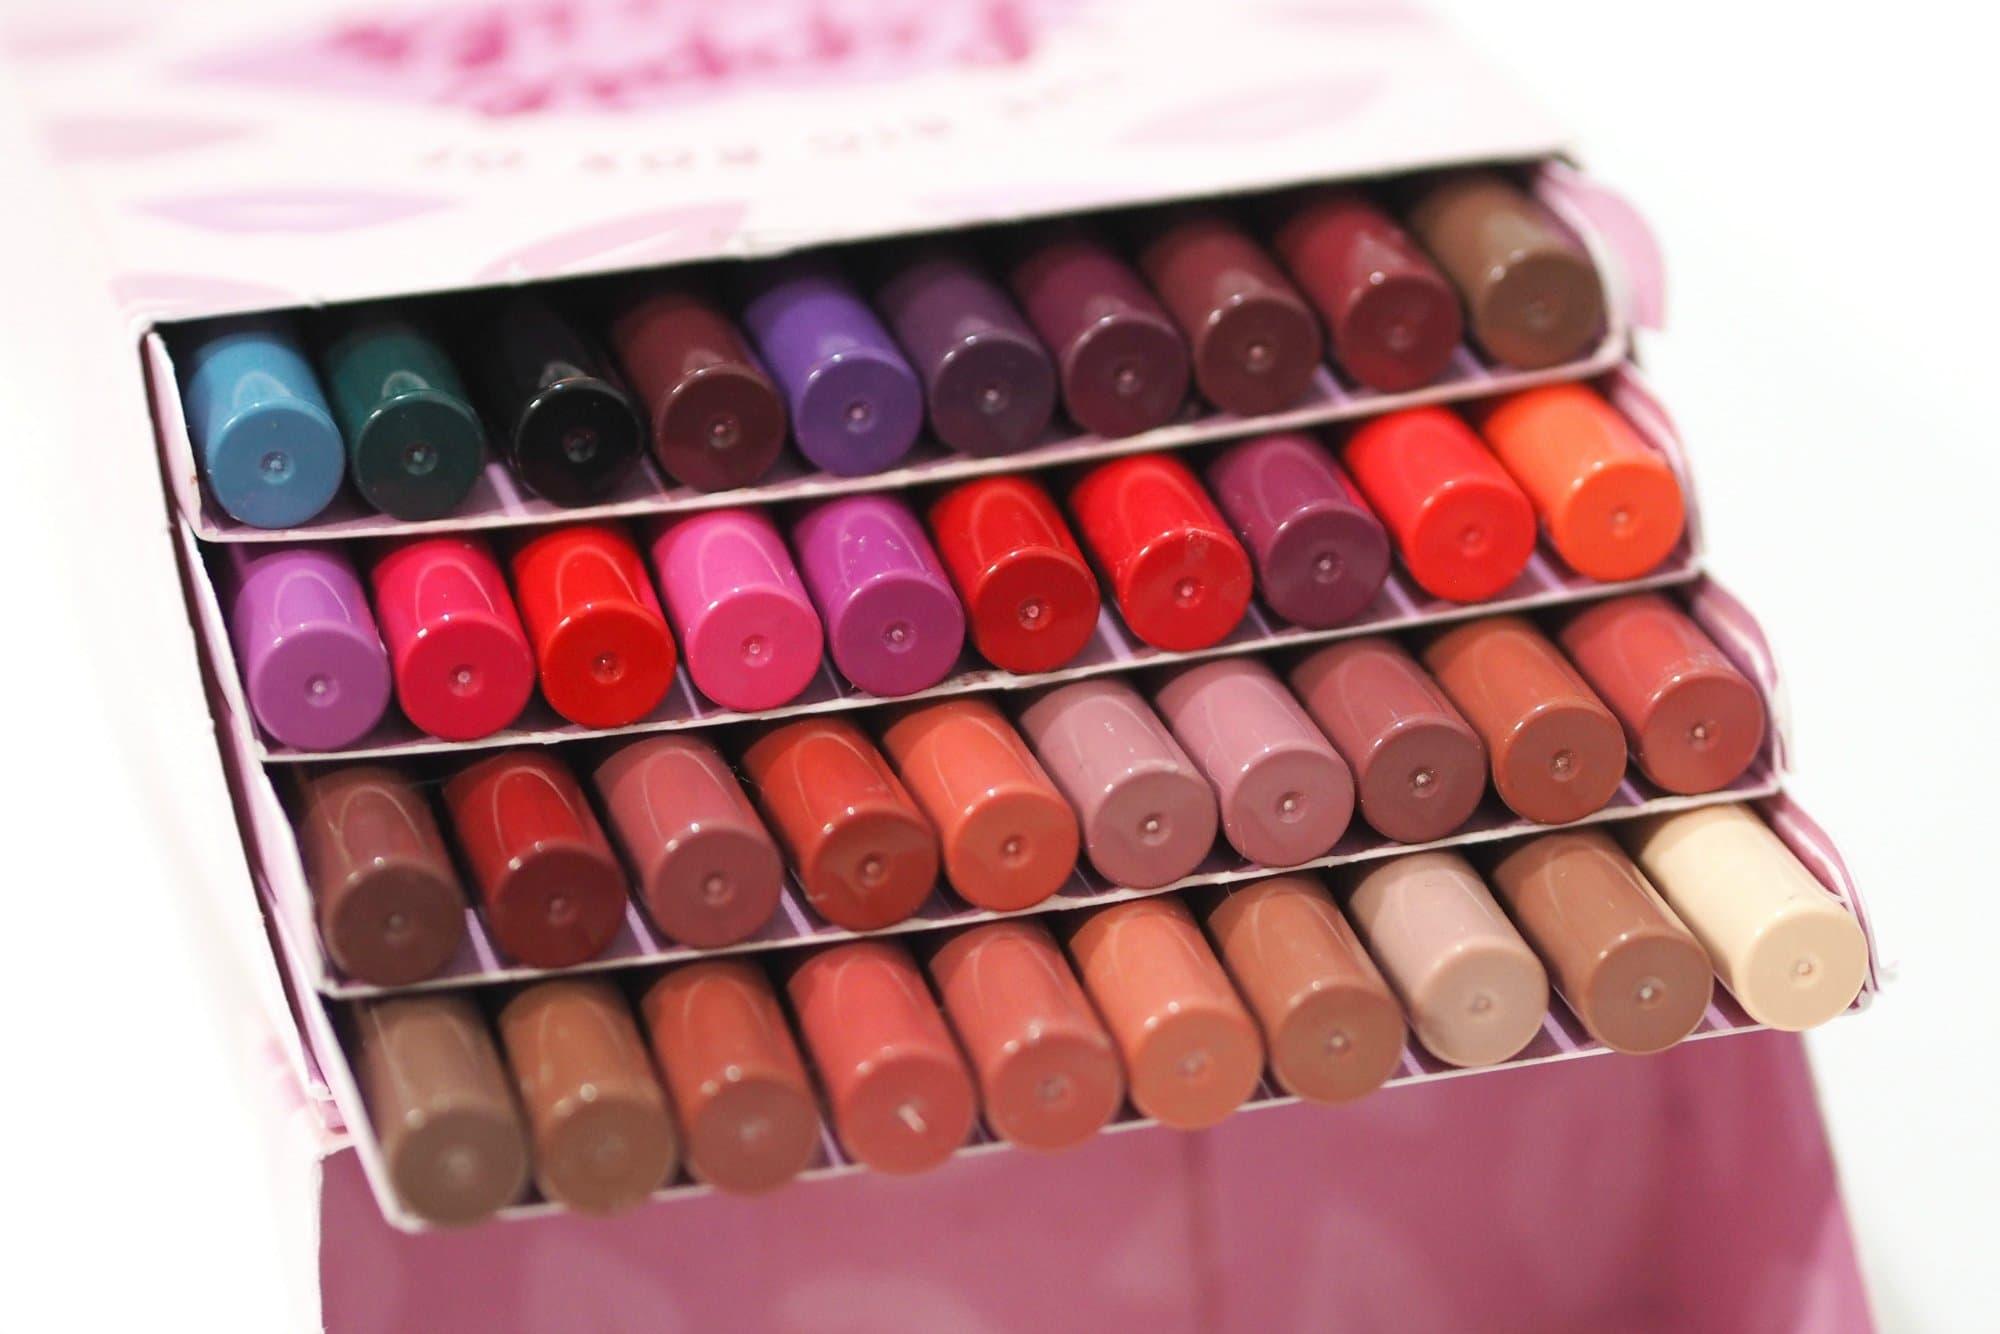 The Big Box Of Lippie Pencils by Colourpop #11